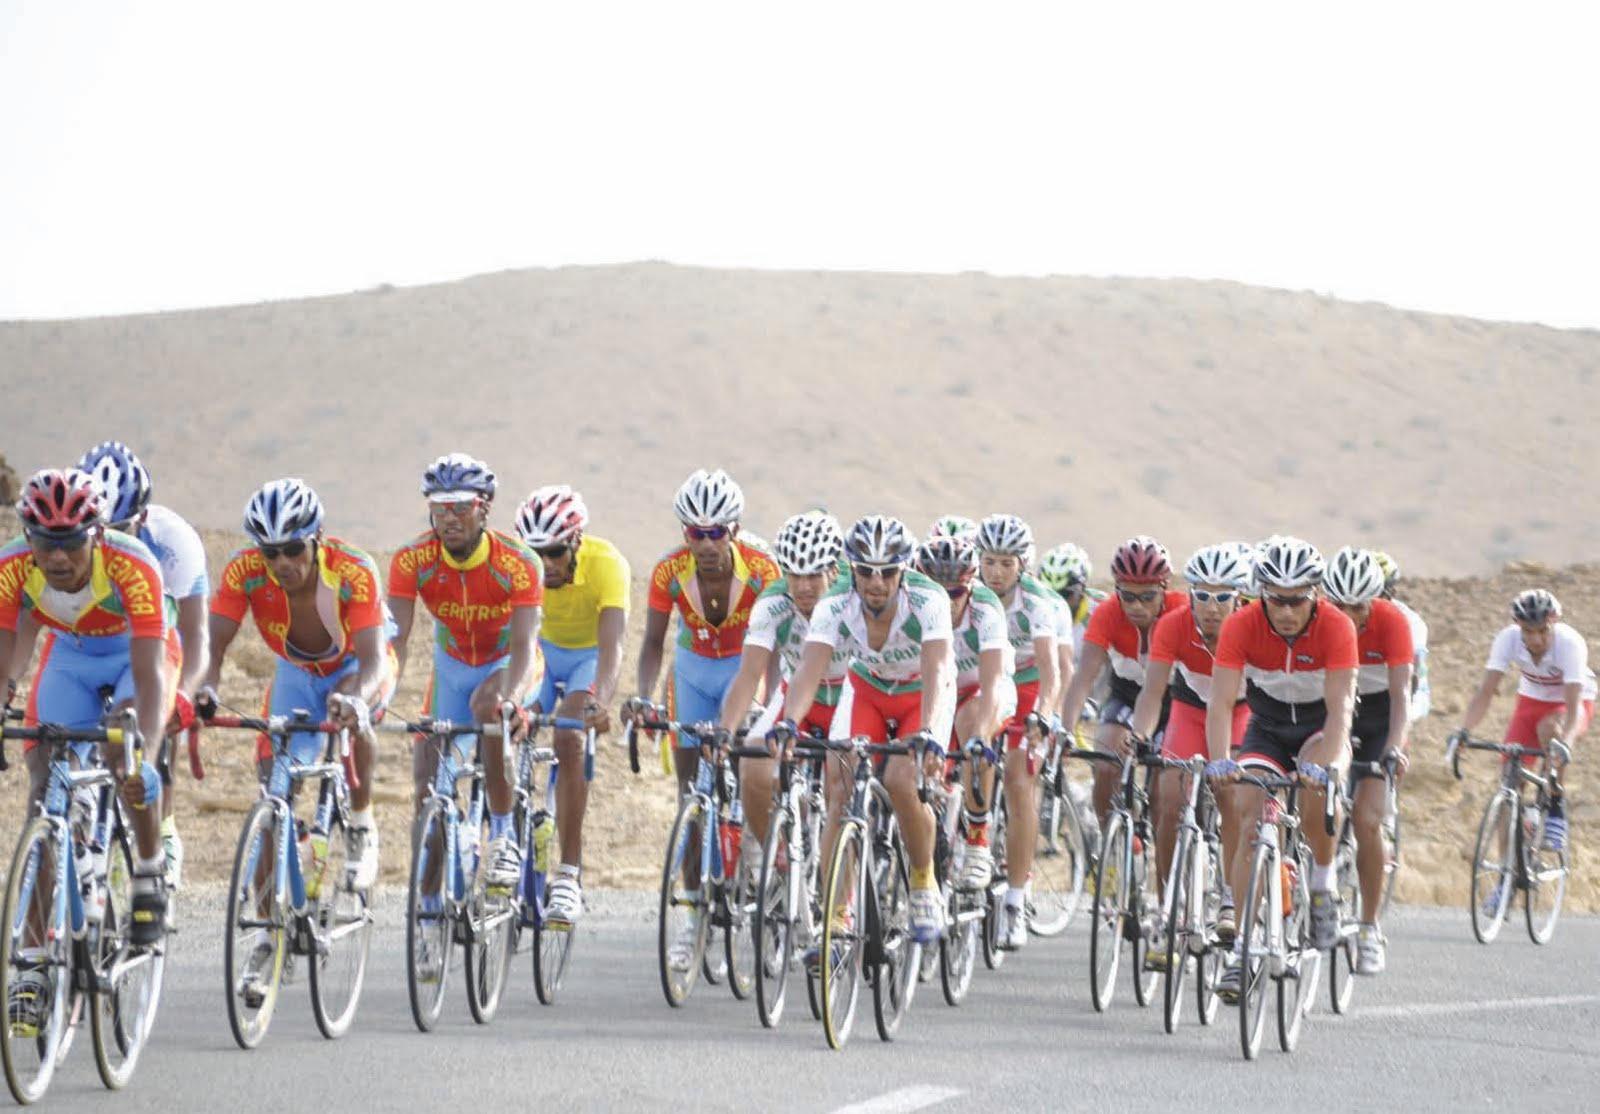 Tour of Eritrea 2016 is set to kick off